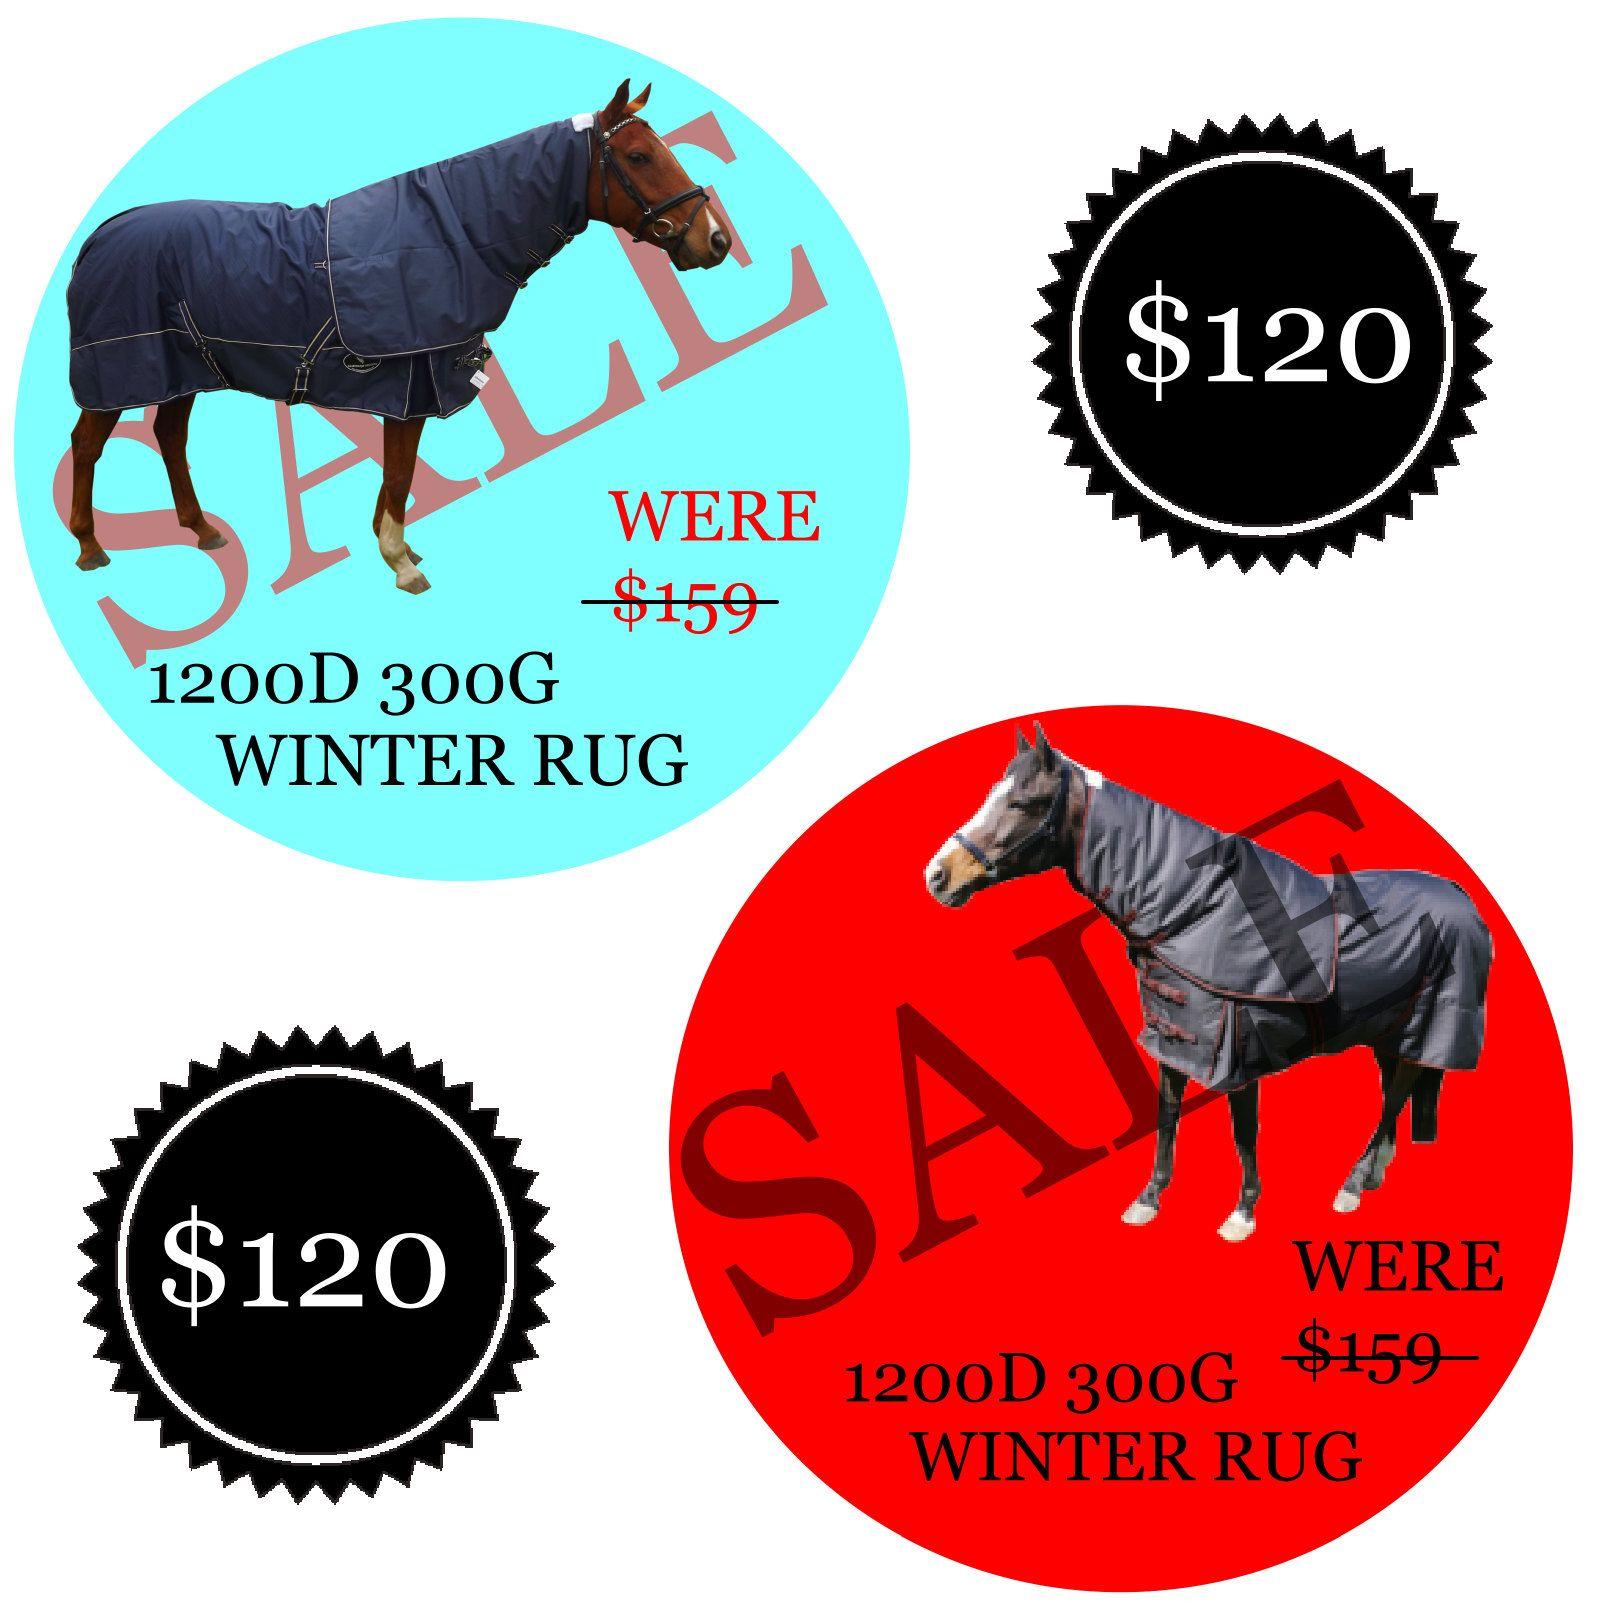 Winter Horse Rugs 1200d 300g Waterproof Turnout Paddock